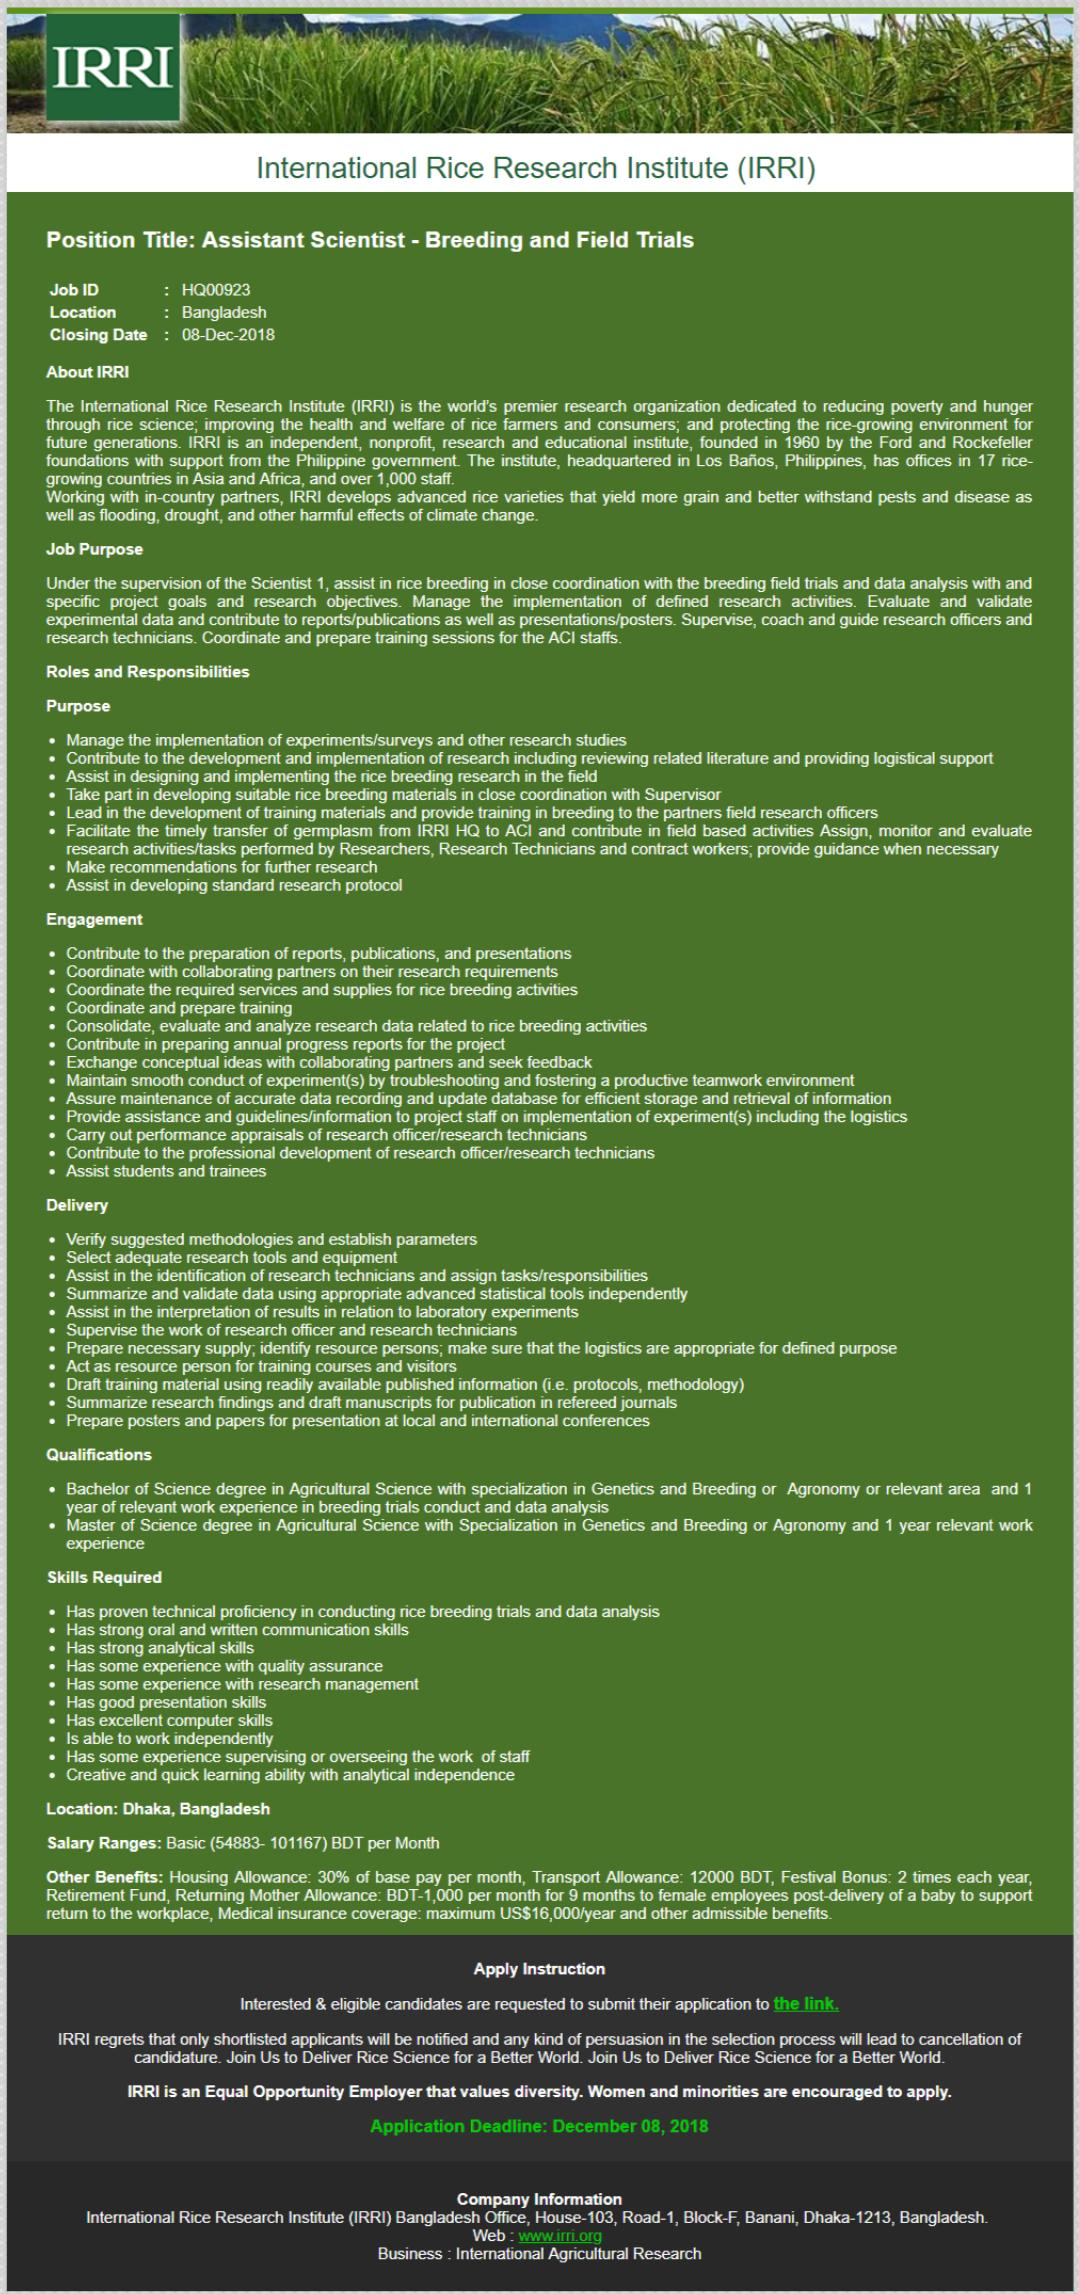 International Rice Research Institute Job Circular